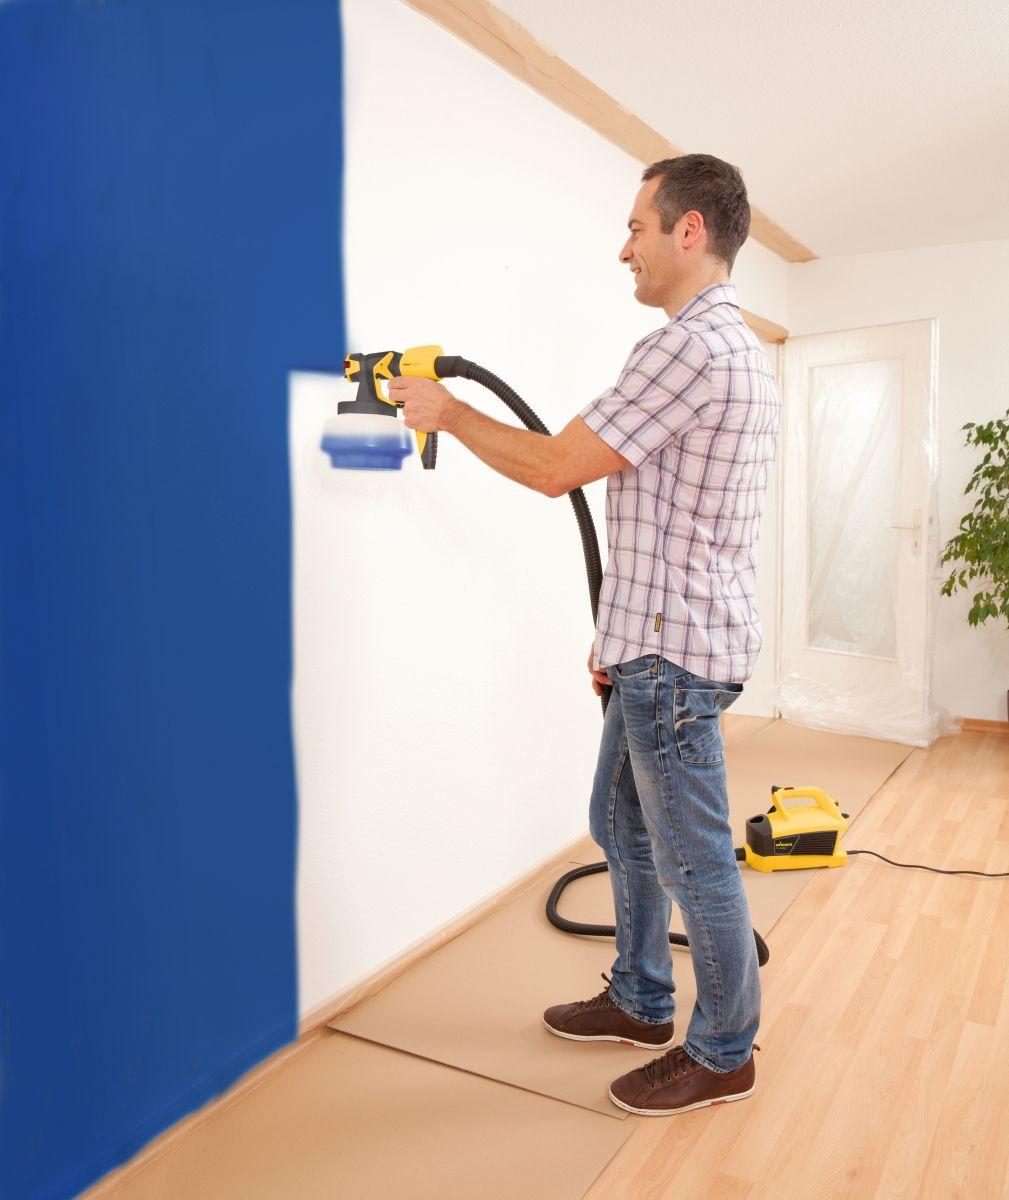 wagner universal sprayer w 690 farbspr hsystem universal. Black Bedroom Furniture Sets. Home Design Ideas